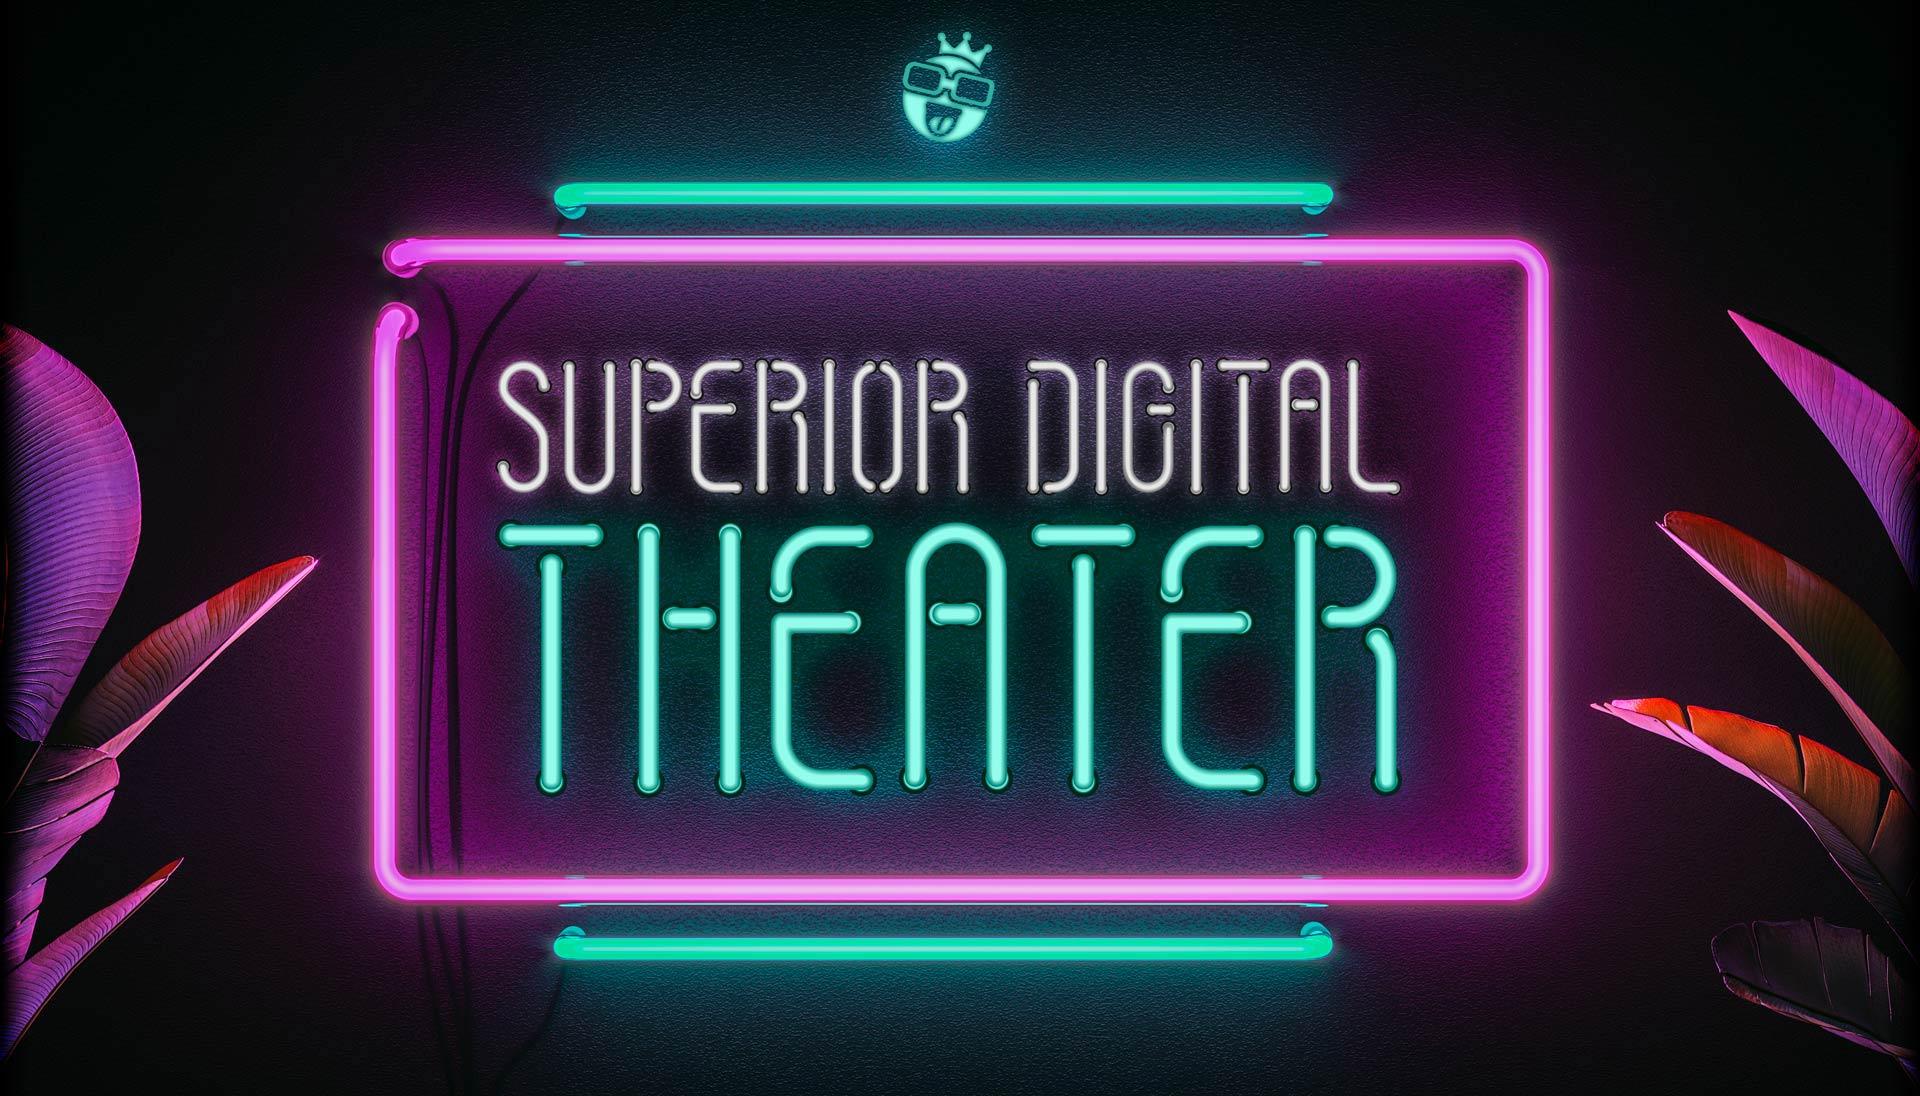 Superior-Digital-Movie-Theater-Neon-Sign